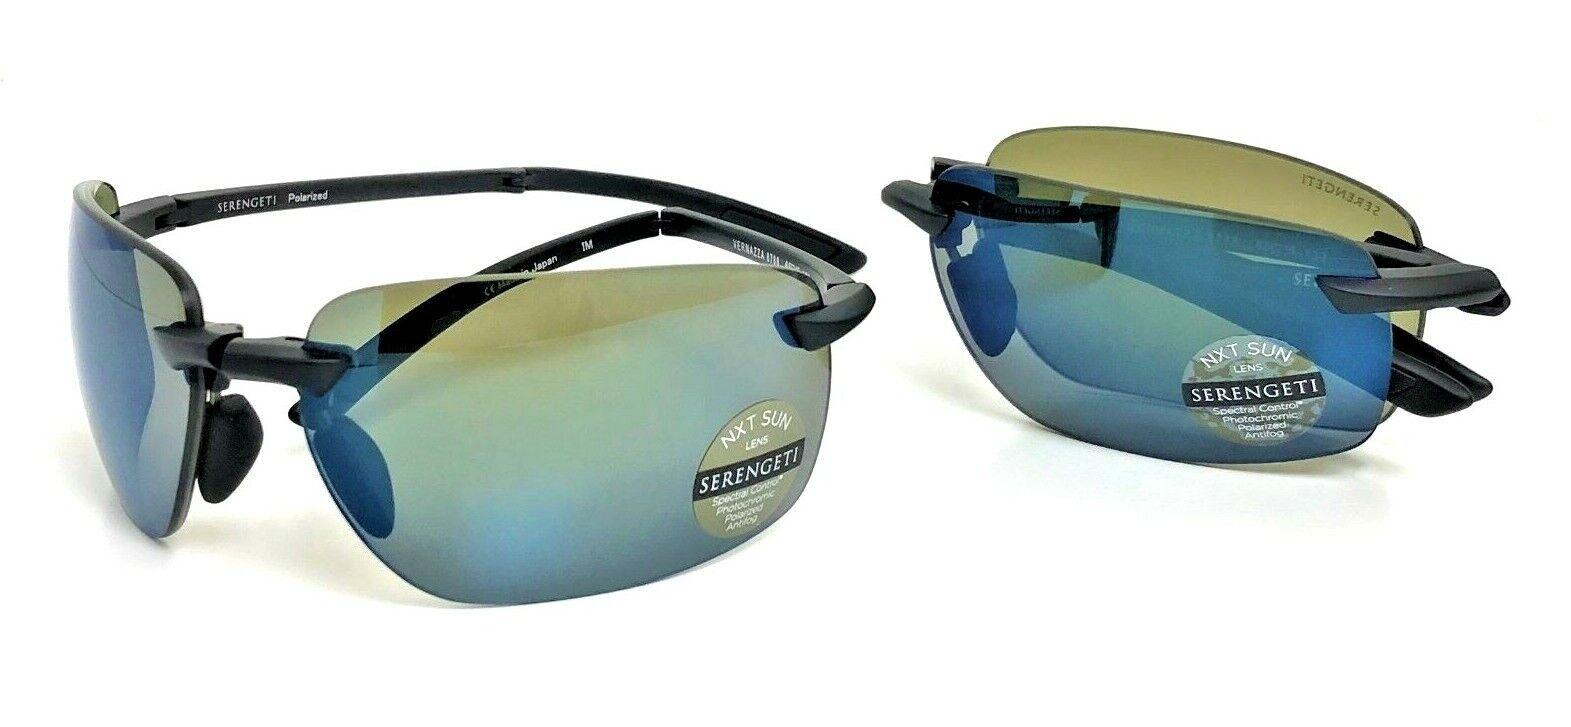 SERENGETI SAVIO Men Round Oval Pilot SUNGLASSES Black OLARIZED Blue Mirror 8560